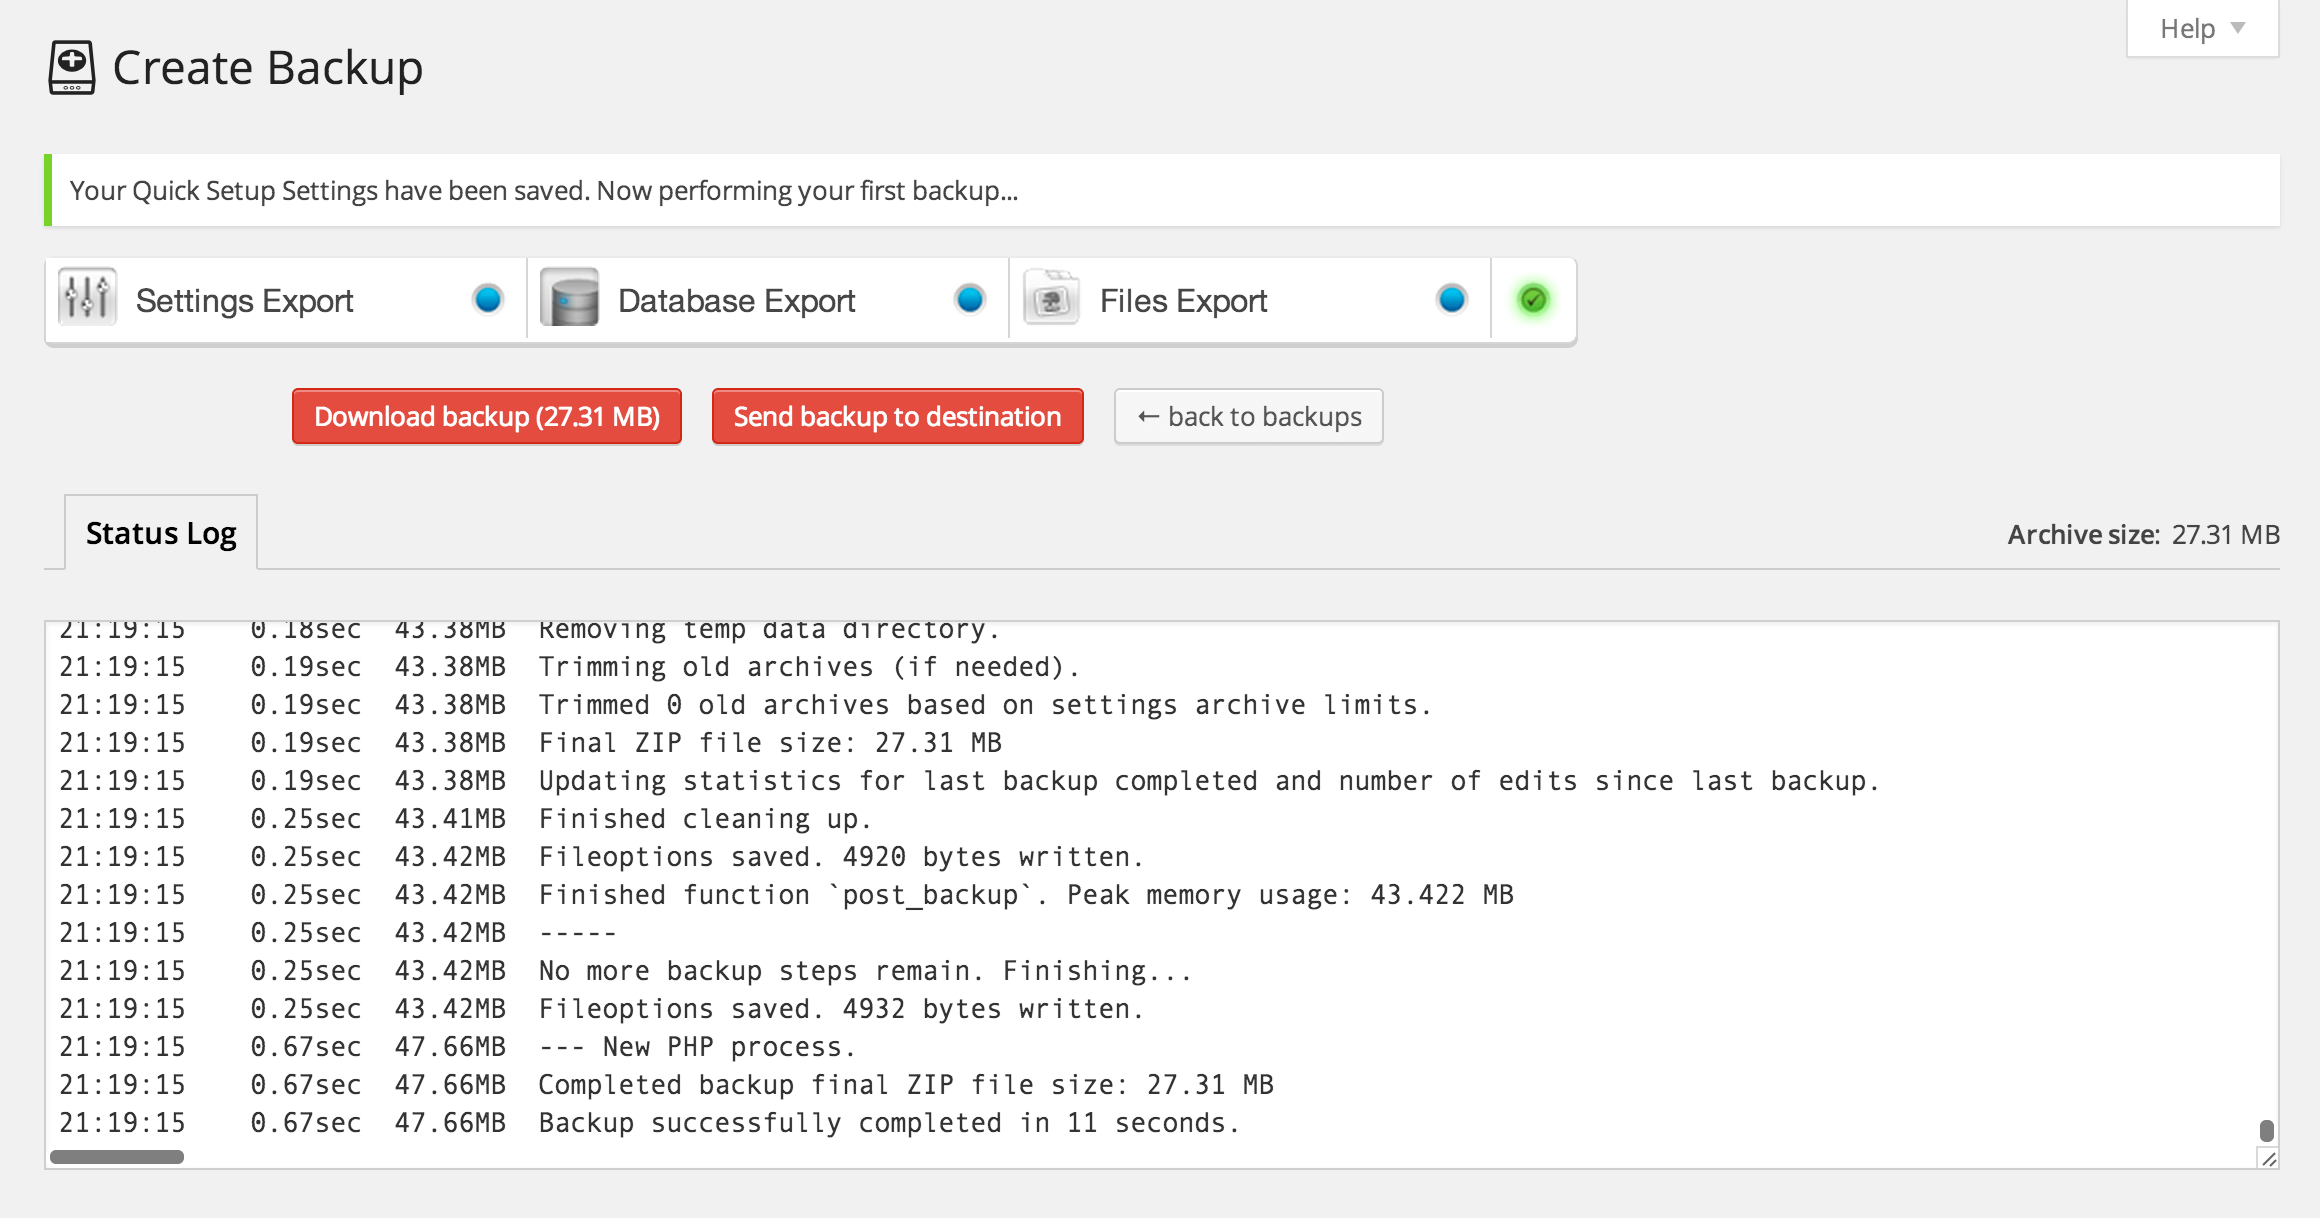 security-backupbuddy-backup-complete